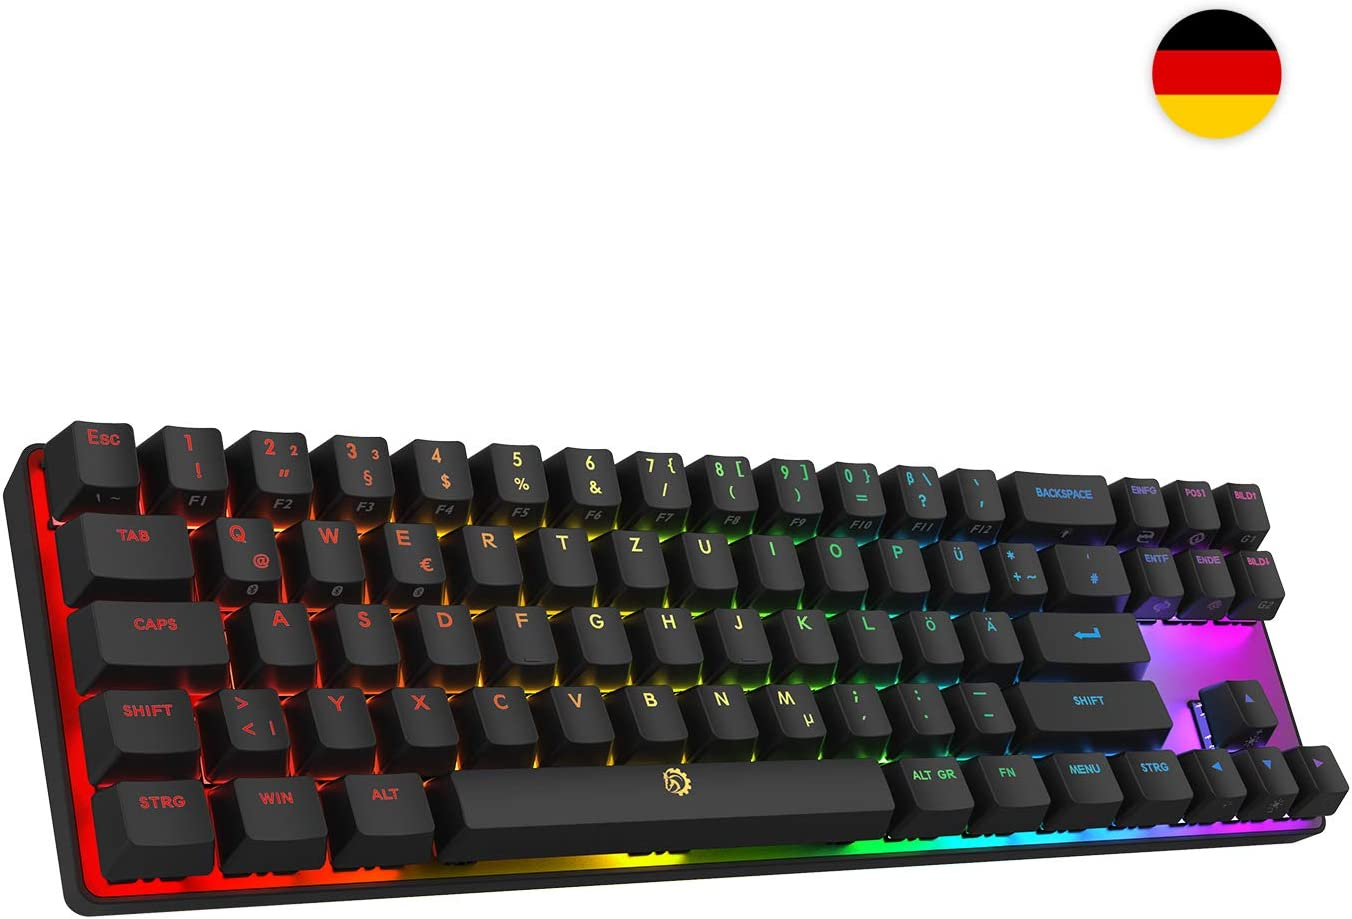 DREVO Calibur 72 clave de juego mecánico teclado RGB LED retroiluminada Tenkeyless inalámbrico Bluetooth 4.0 - deutsche layout (Switch Rojo, Negro)